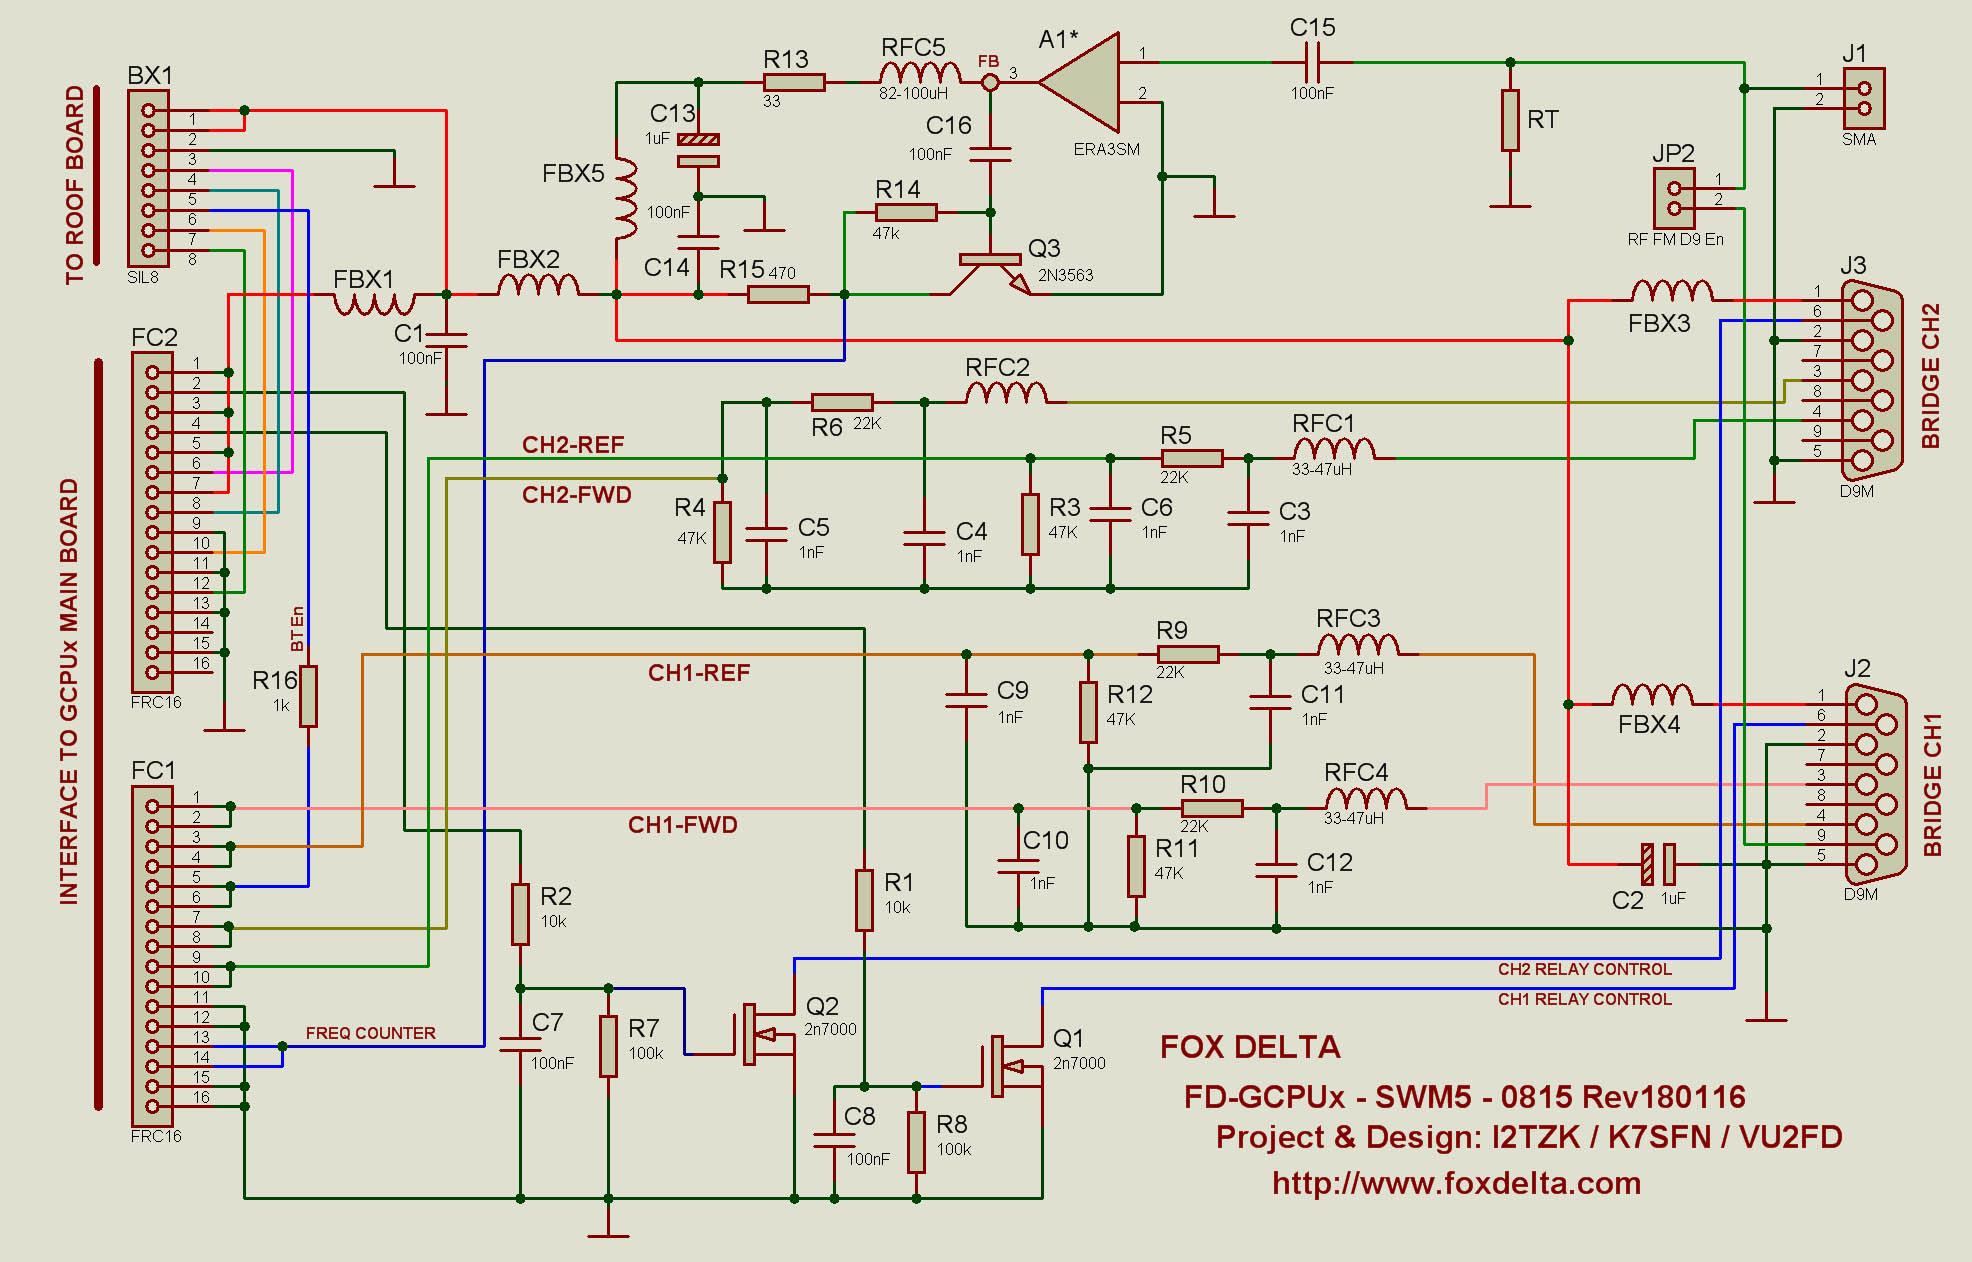 swm lnb wiring diagram wiring diagram and hernes directv hd satellite dish rv tripod kit swm 3 lnb tkt 3sb directv 5 lnb wiring diagram nilza source